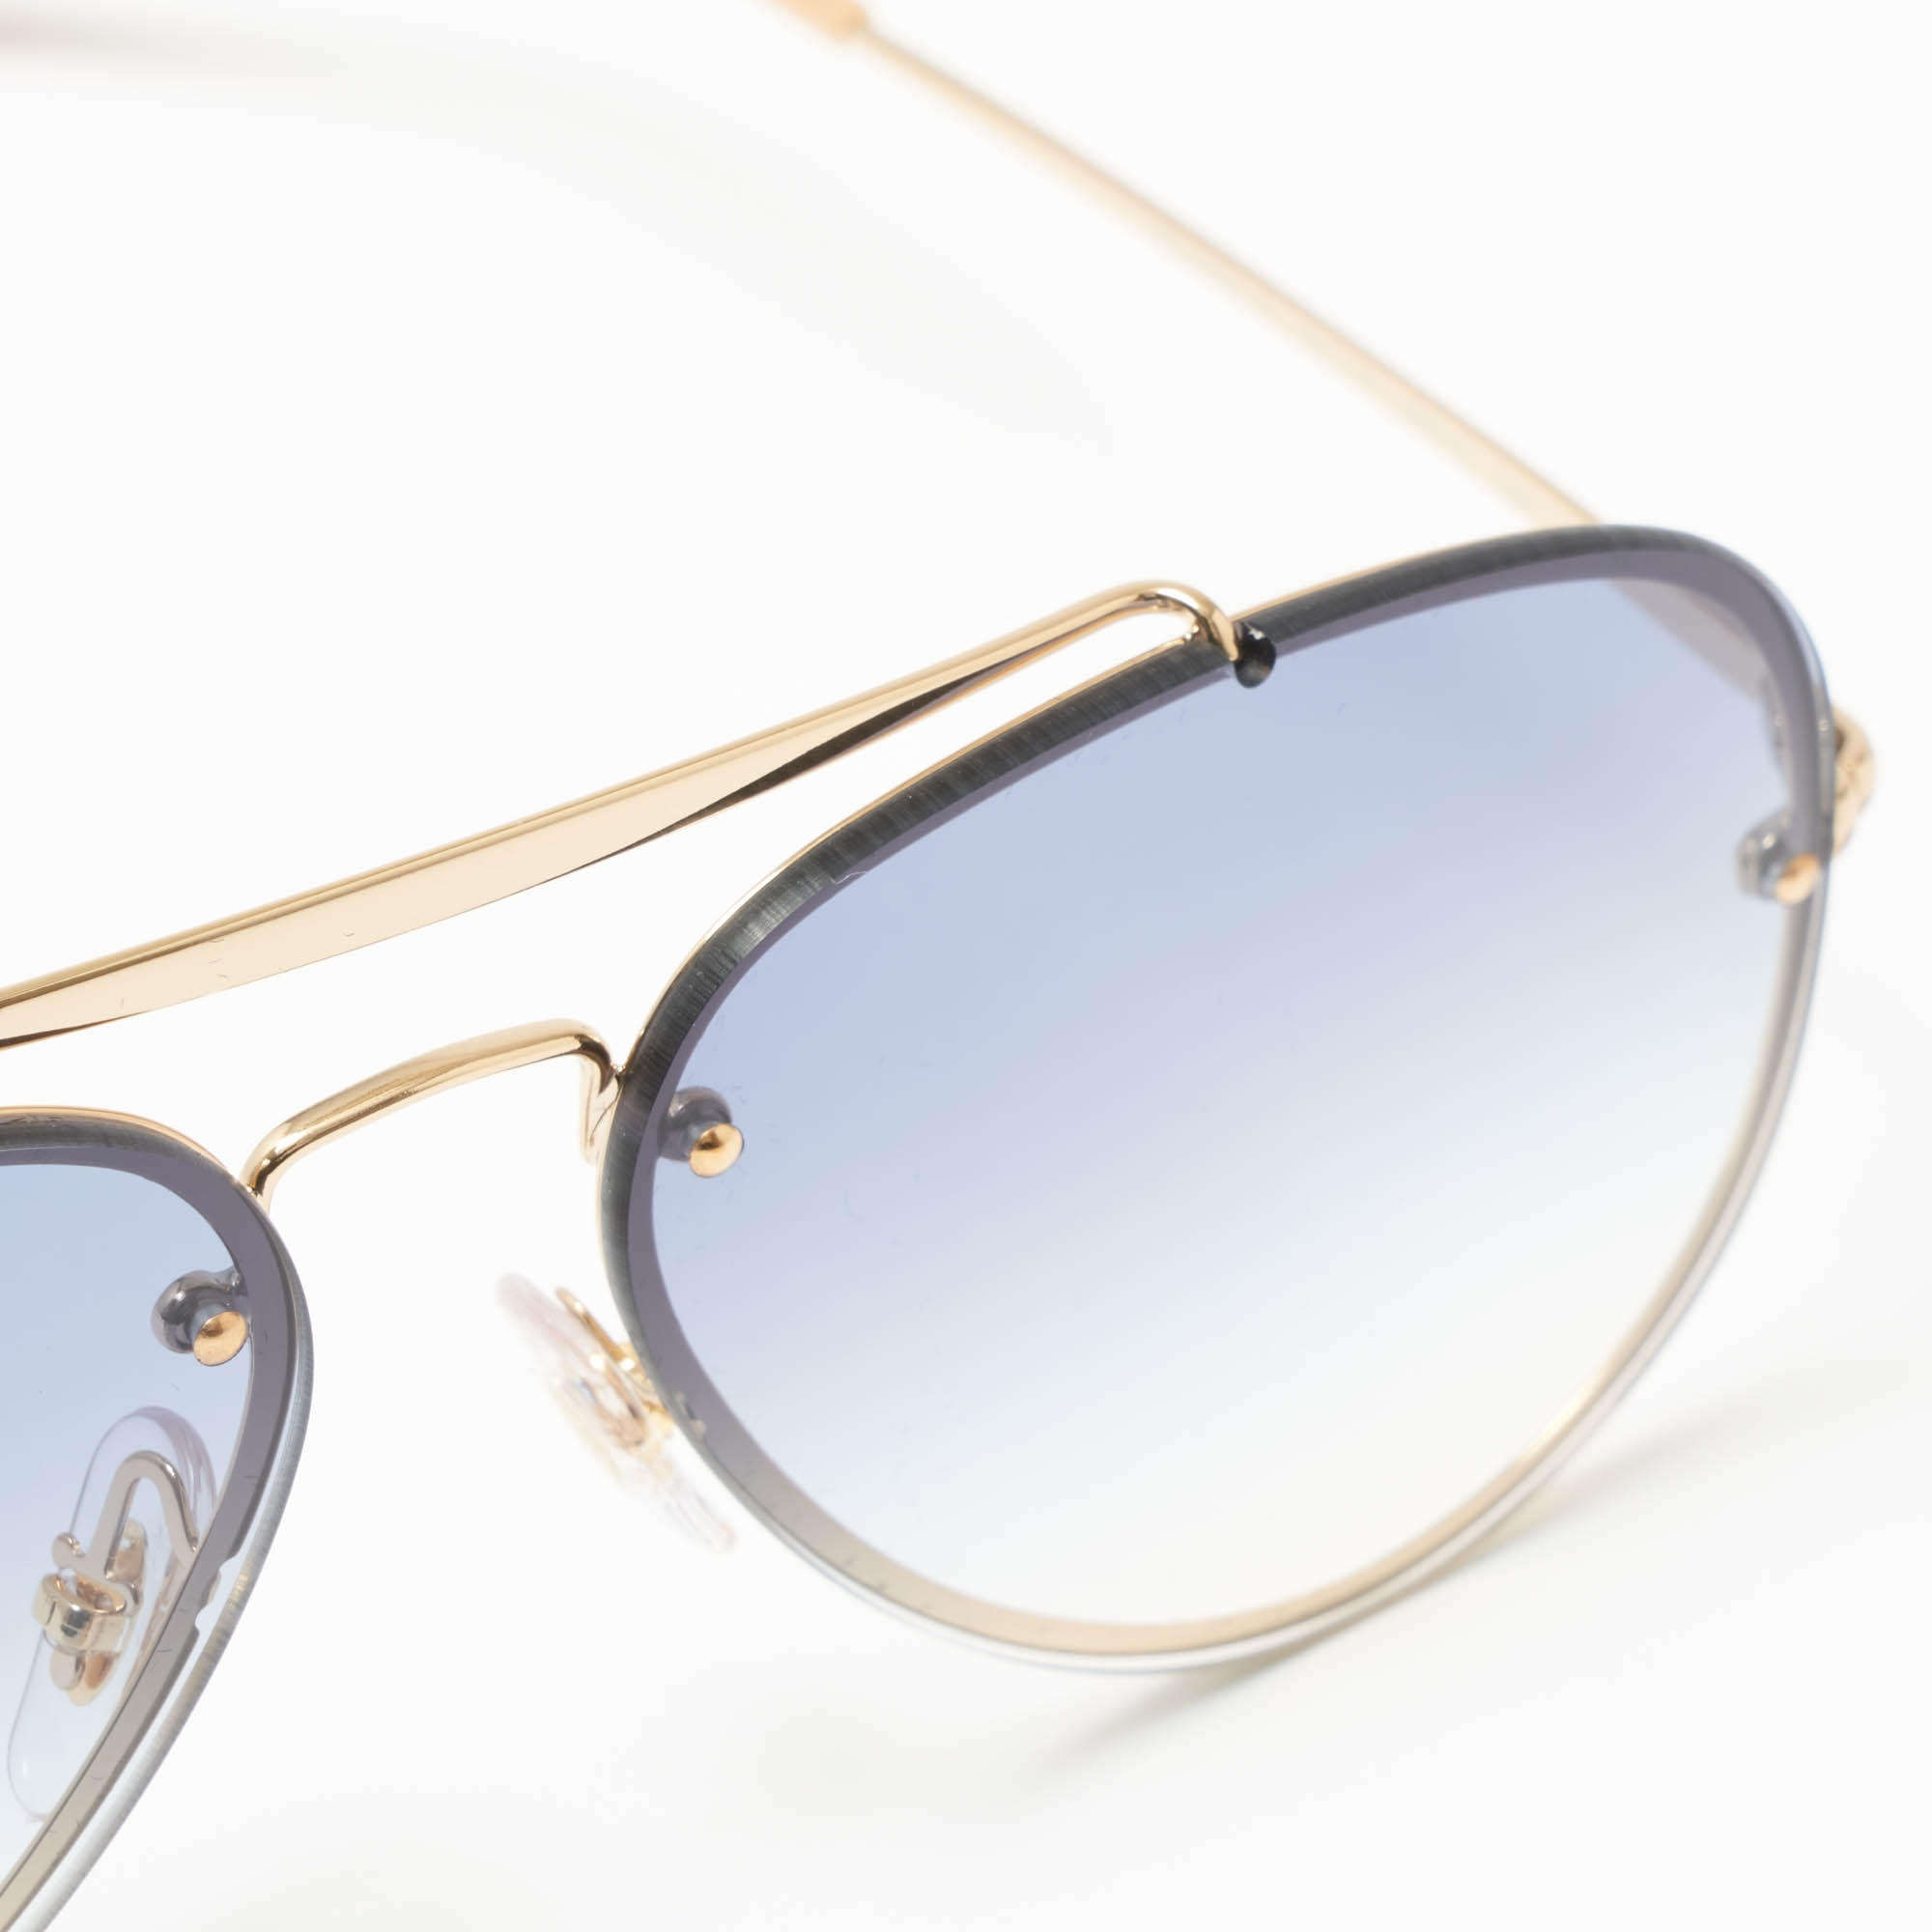 09ed8a82bc59a Gold Blaze Aviator Sunglasses - Light Blue Gradient Lenses